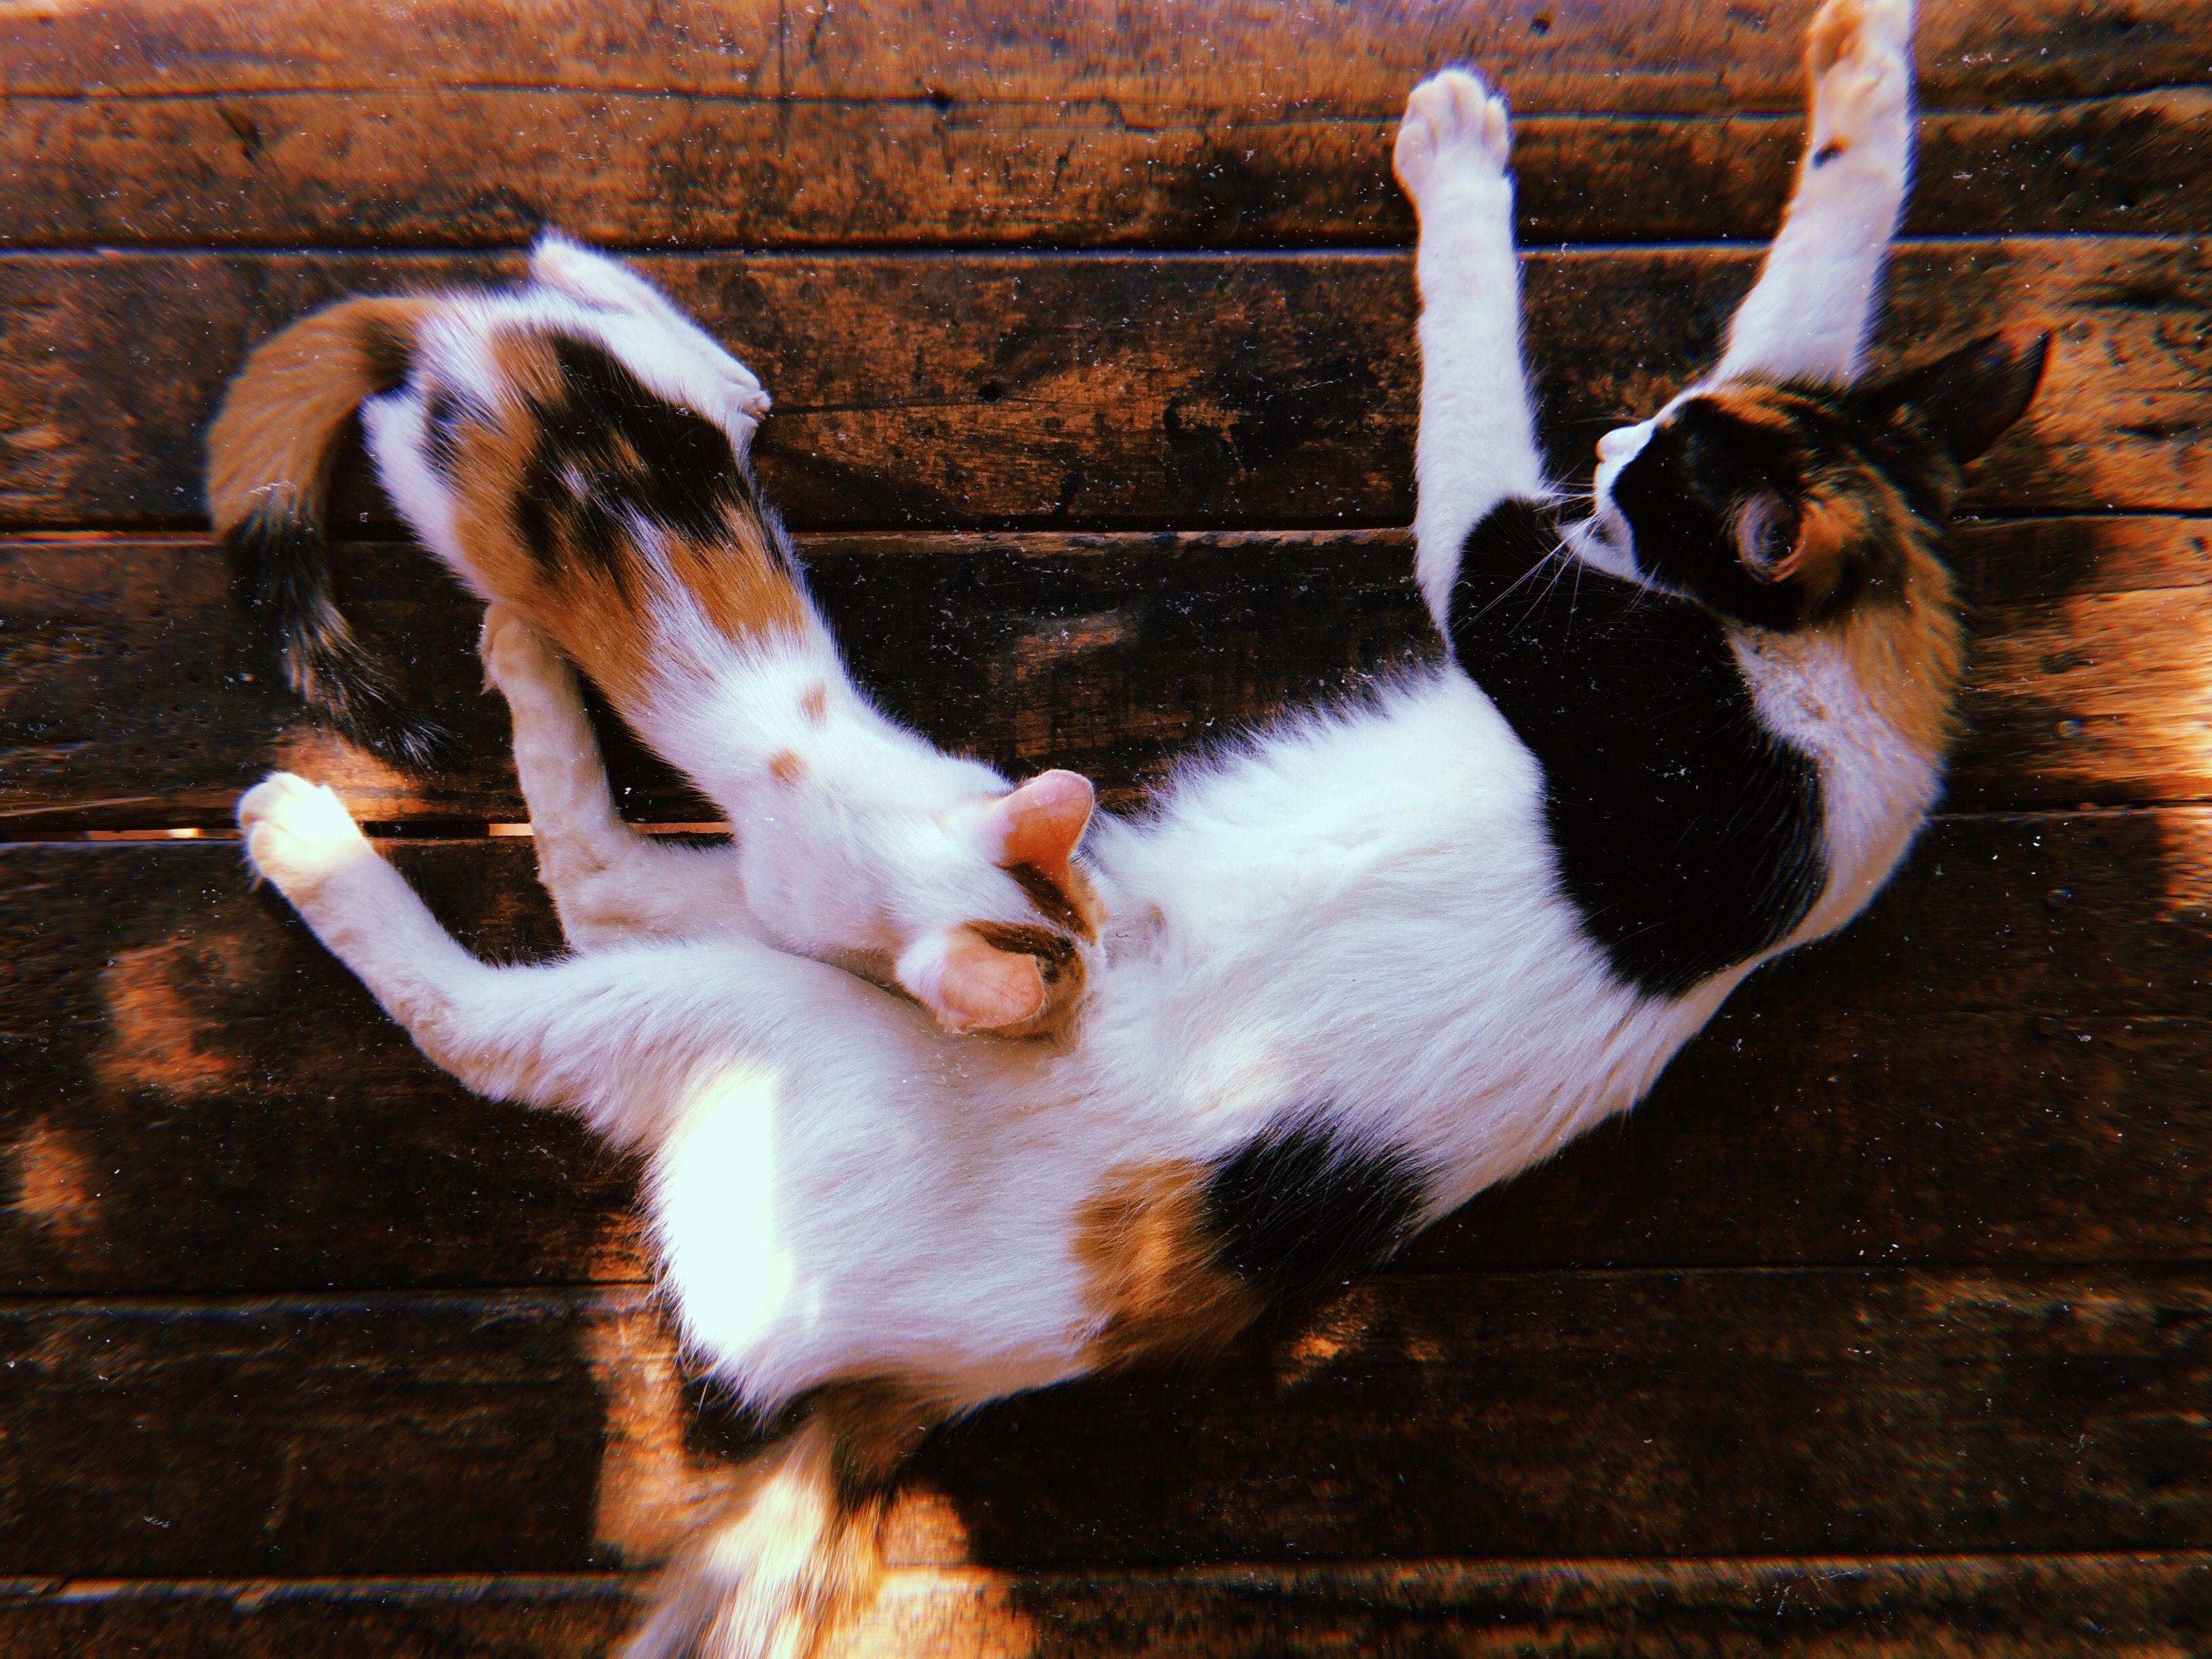 #cats #catlovers #momandbaby